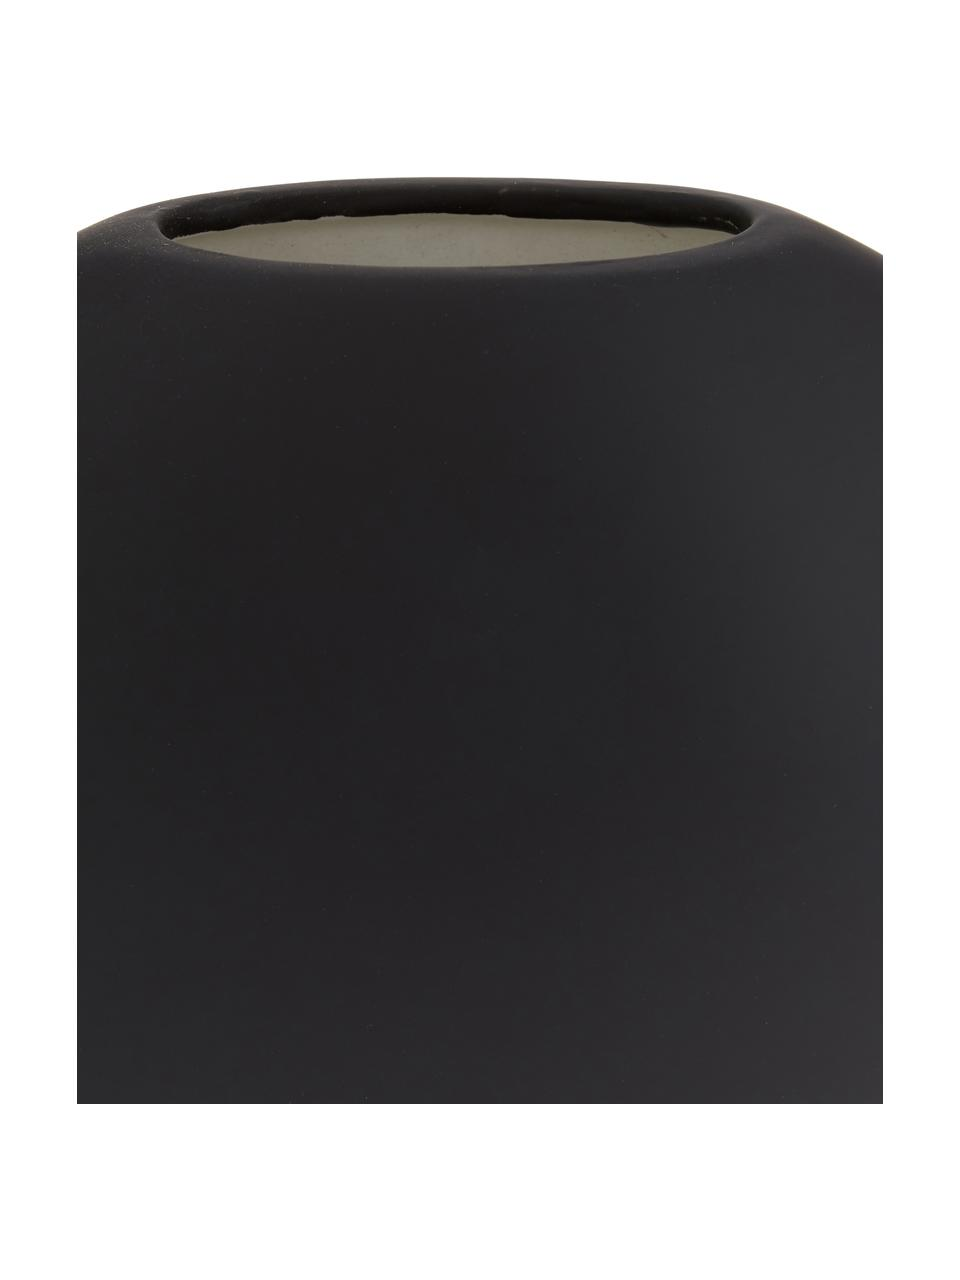 Vaso in ceramica fatto a mano Pastille, Ceramica, Nero, Larg. 20 x Alt. 19 cm